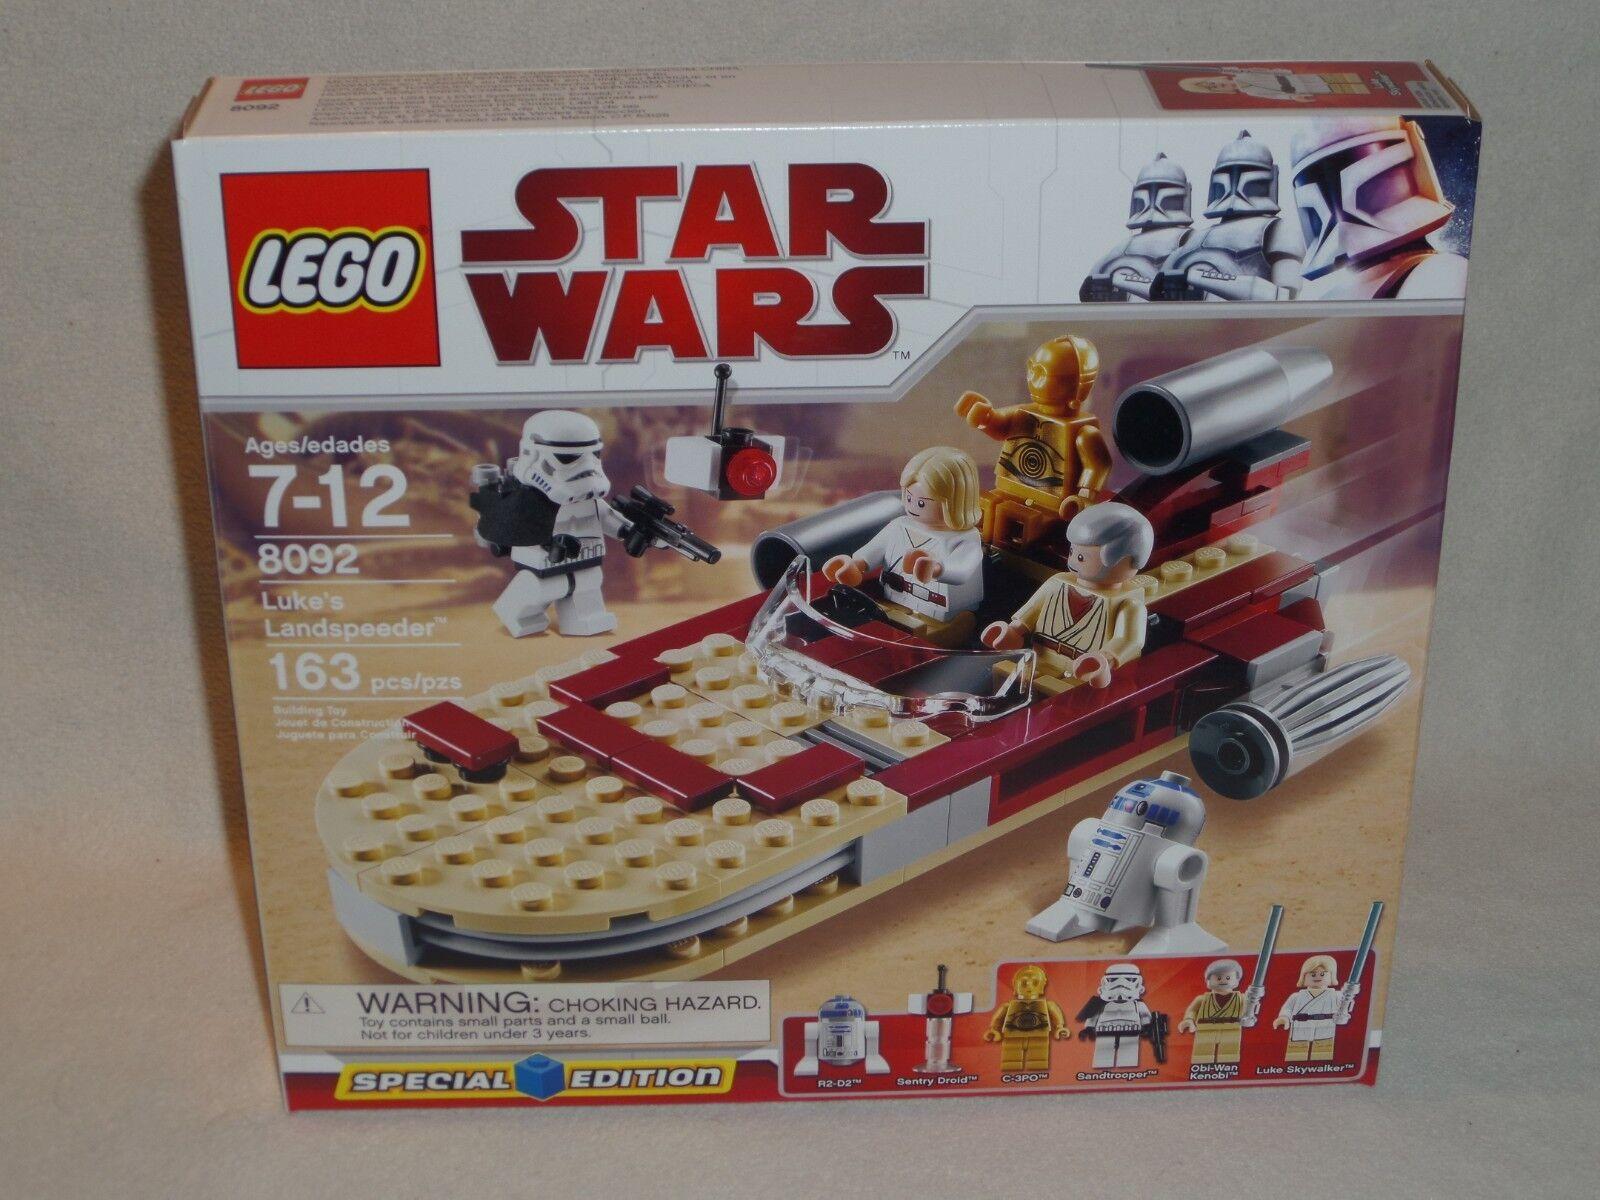 LEGO Star Wars Special Edition Set 8092 Luke's Landspeeder NISB